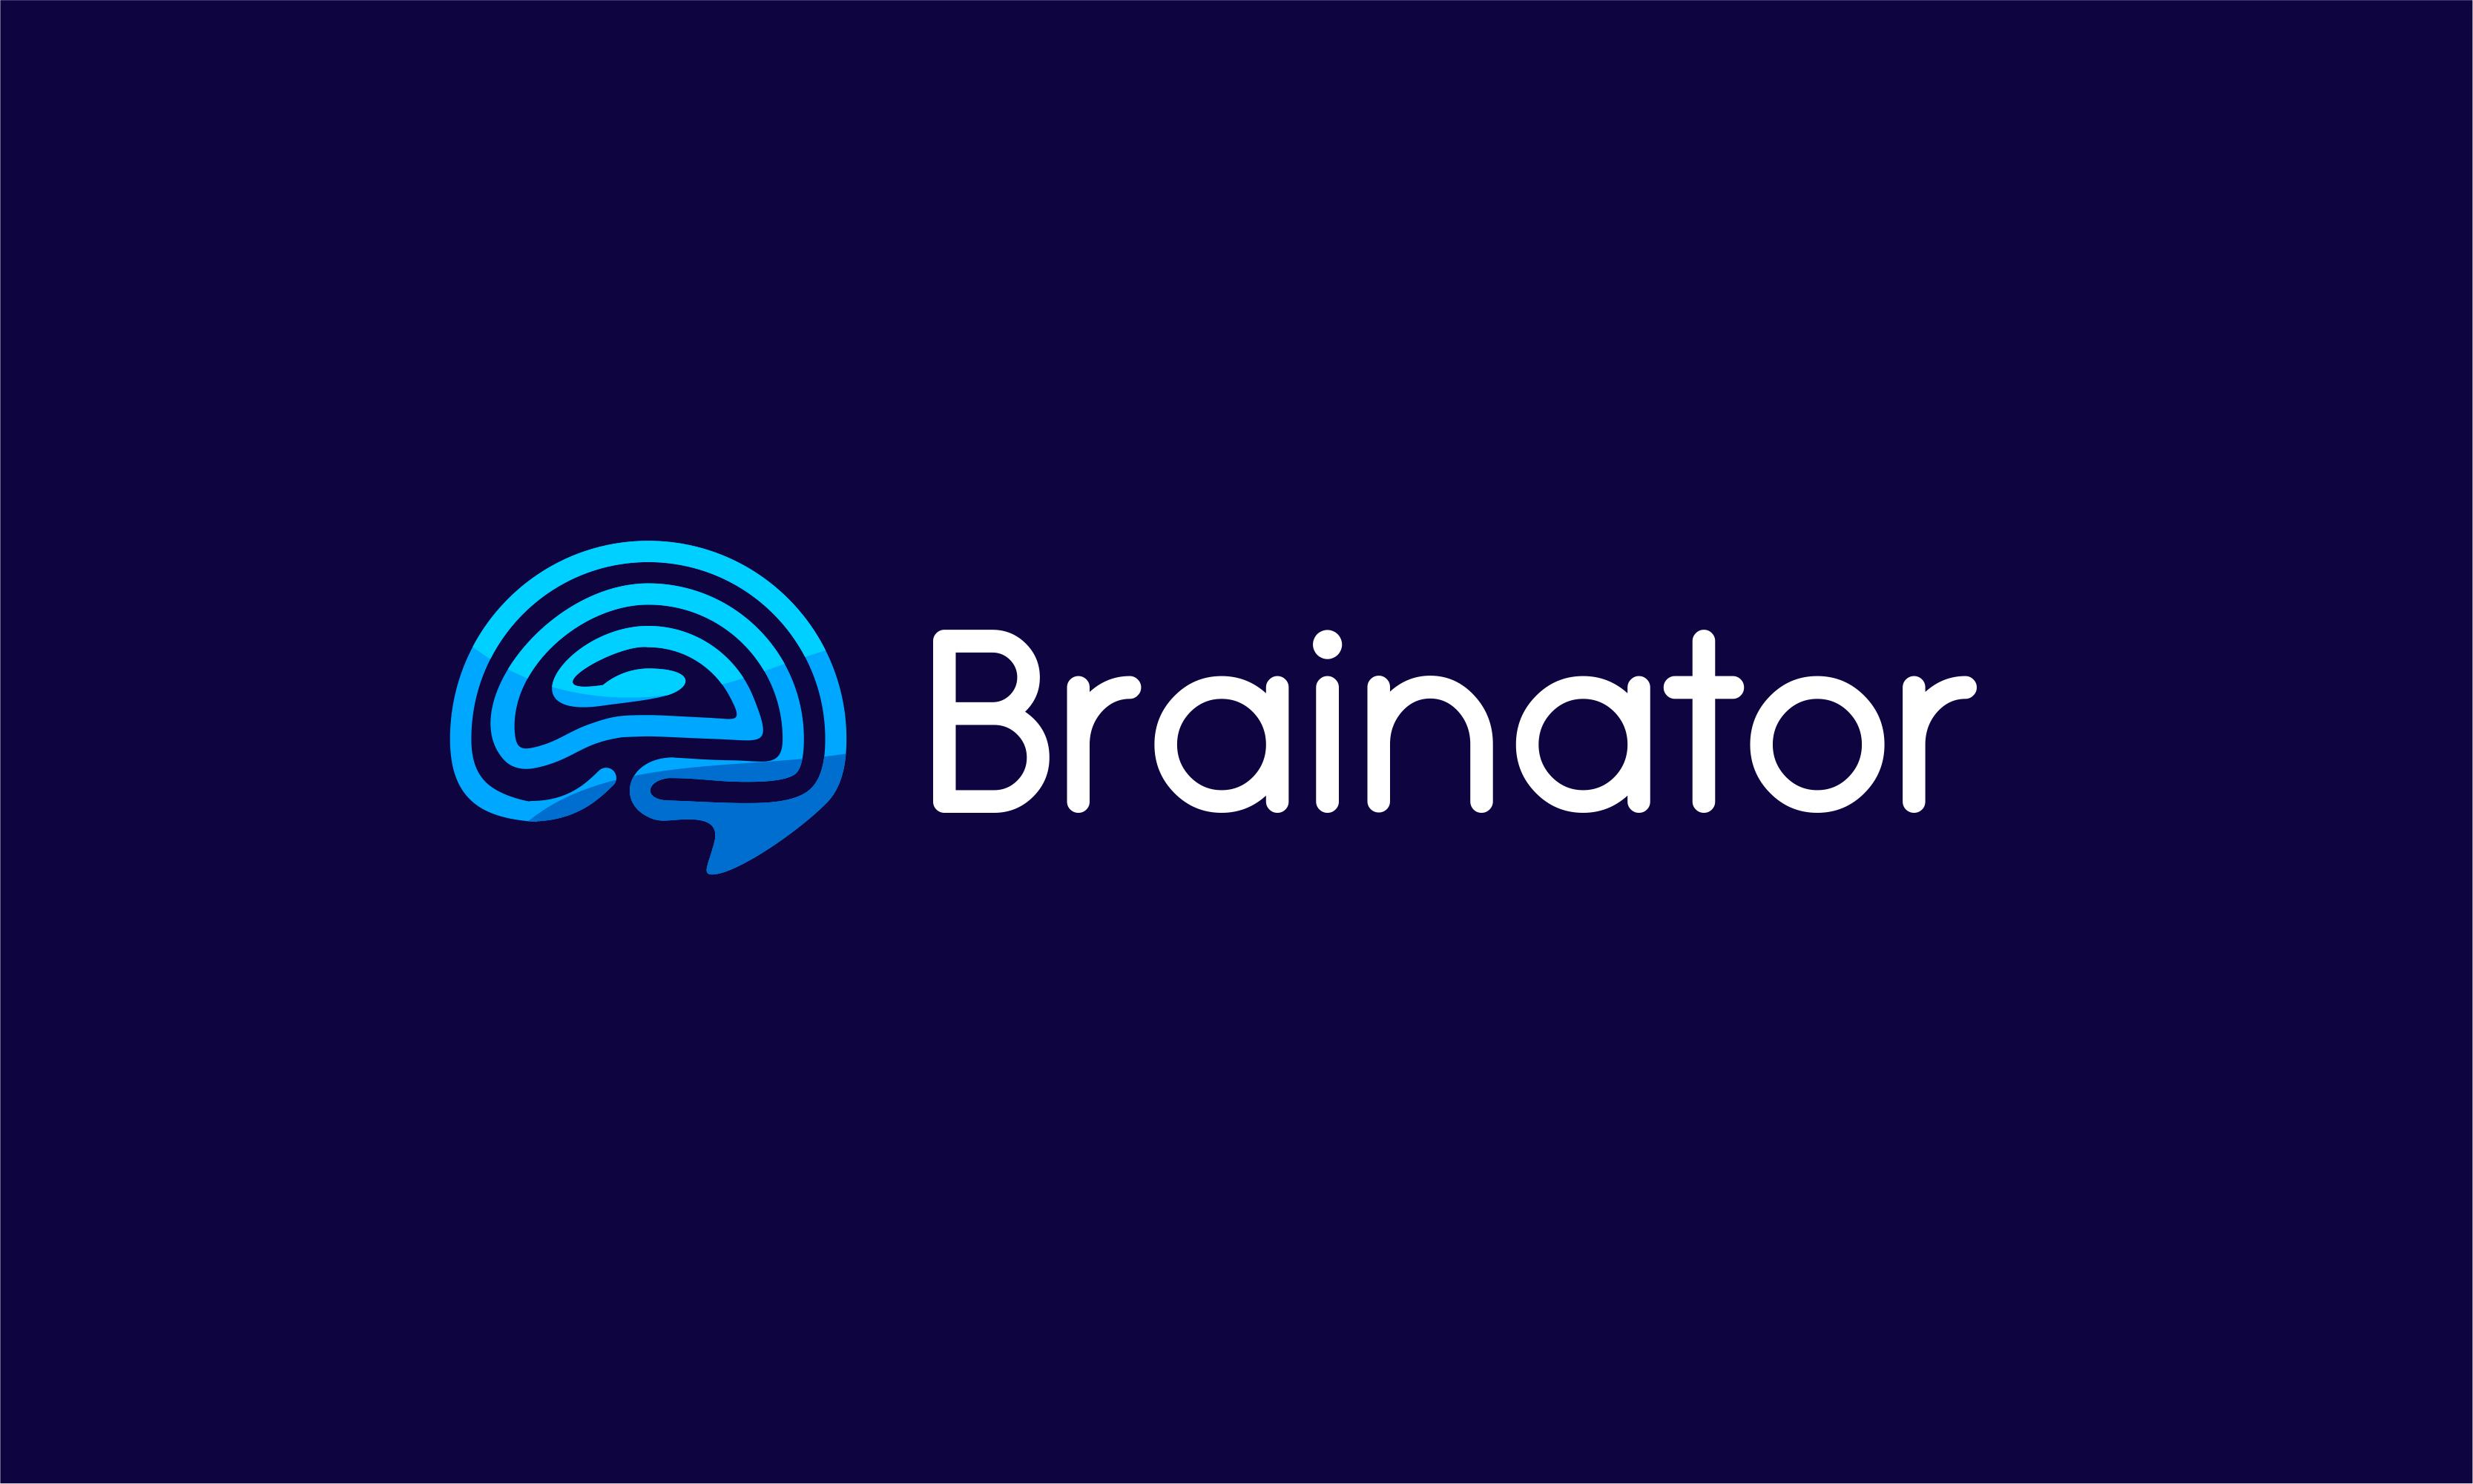 Brainator